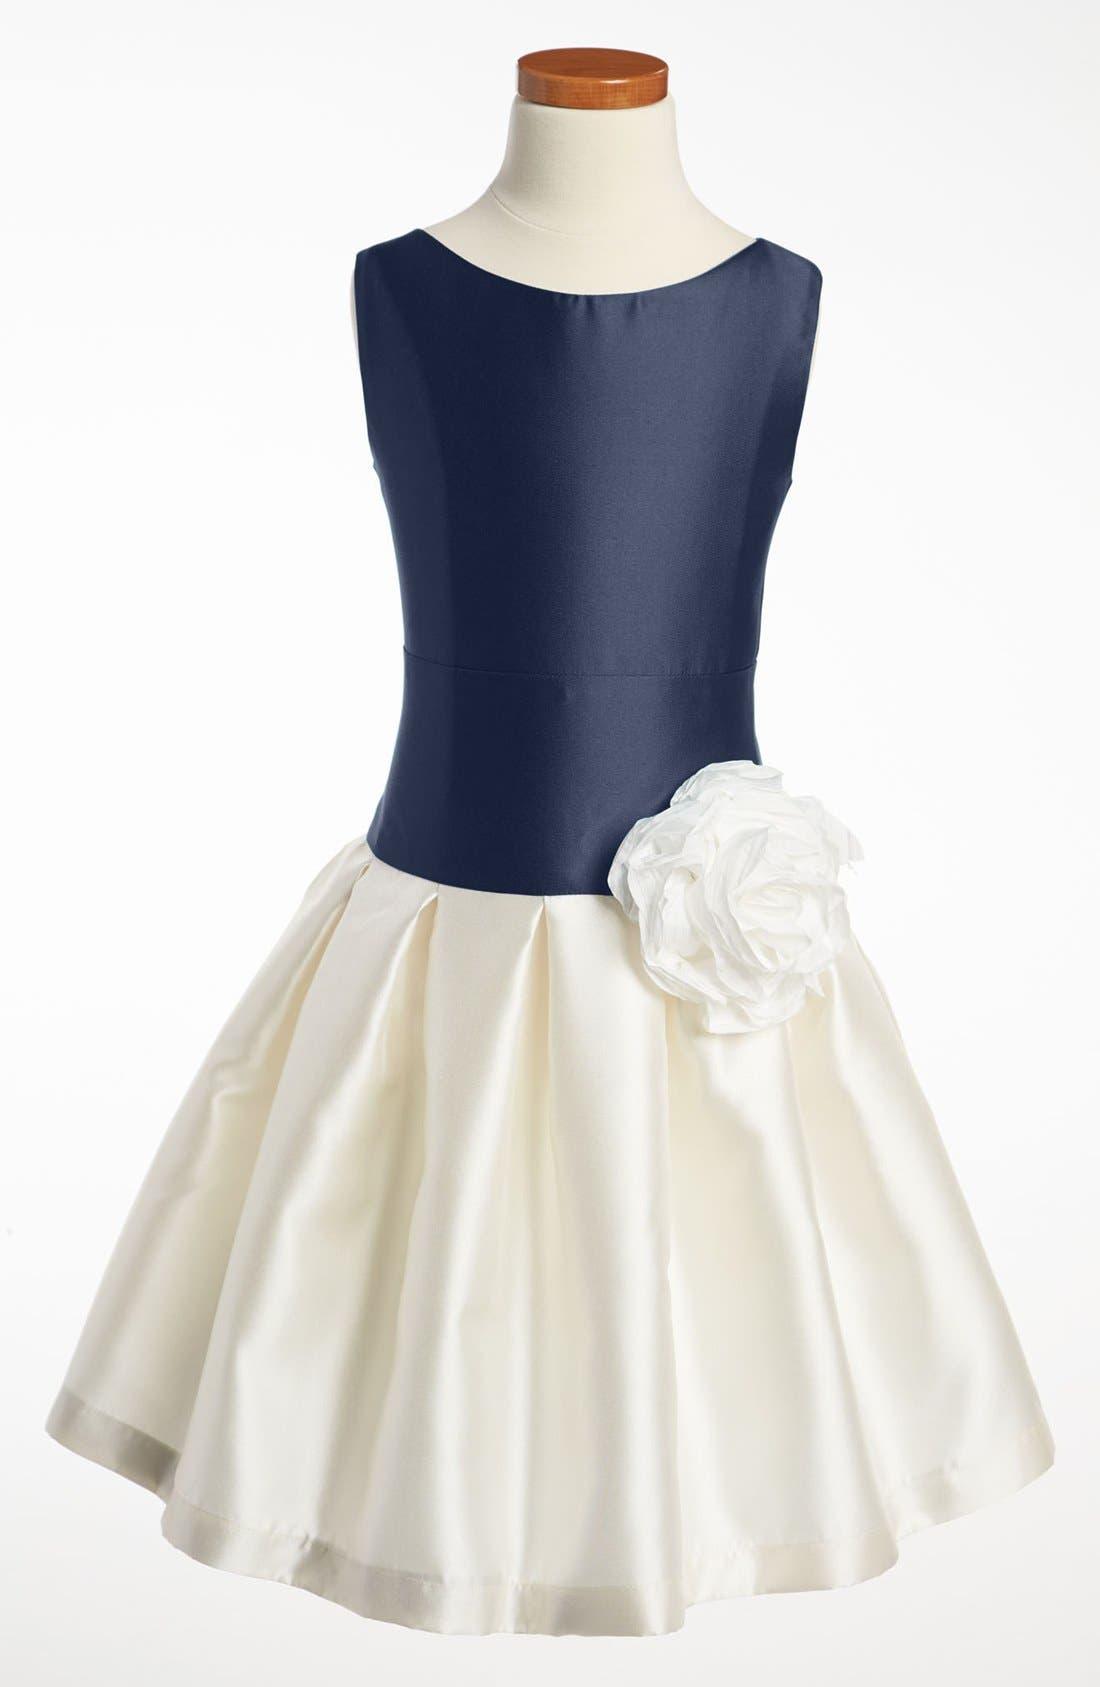 Main Image - Zoe Sleeveless Dress (Big Girls)